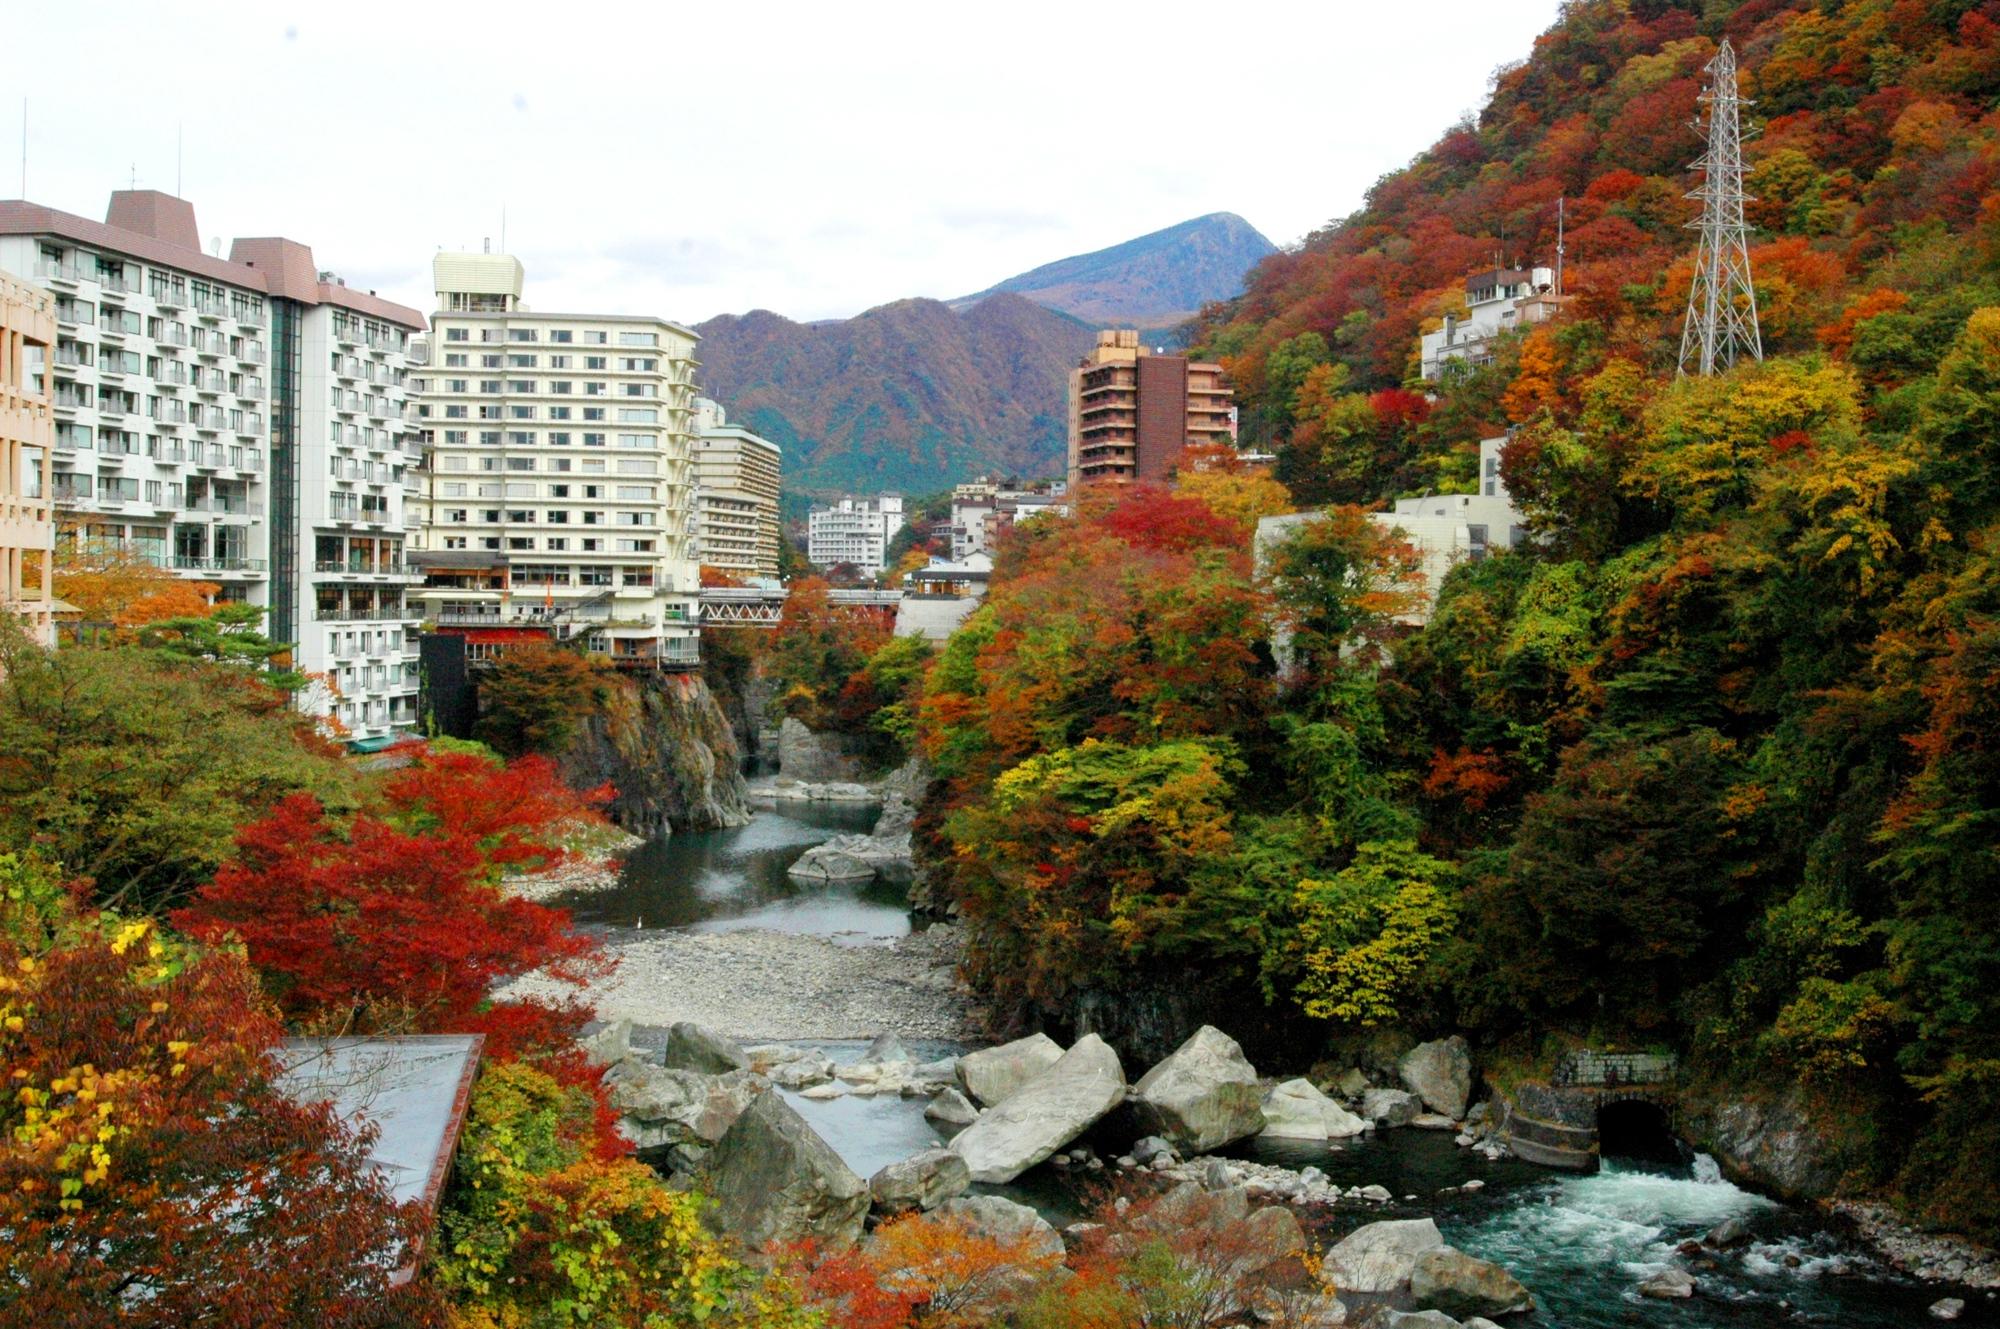 photo by鬼怒川温泉|フォトライブラリー|日光旅ナビ